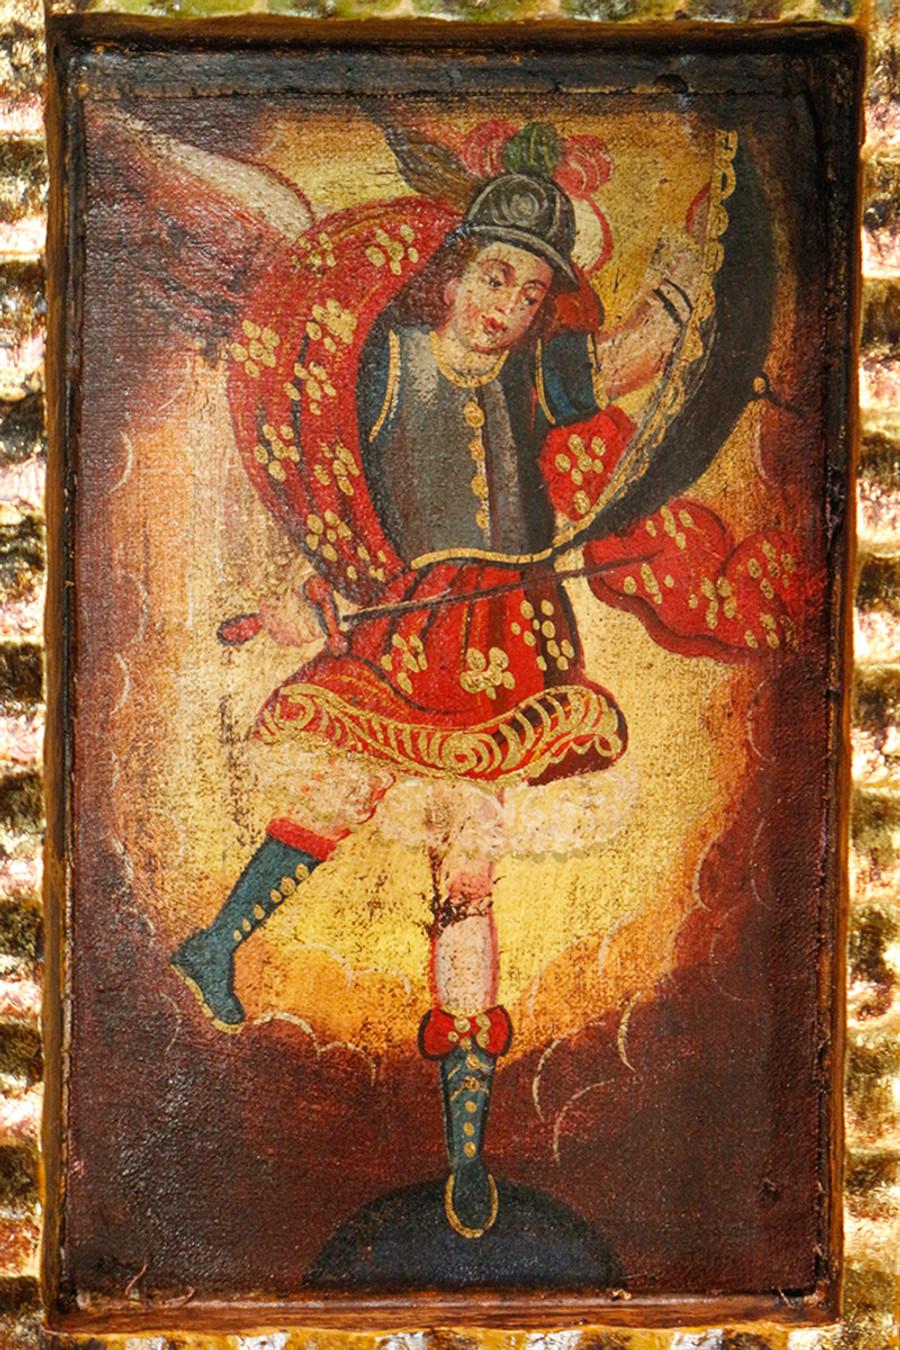 Archangel Michael Colonial Peru Art Handmade Retablo Handcarved Altarpiece